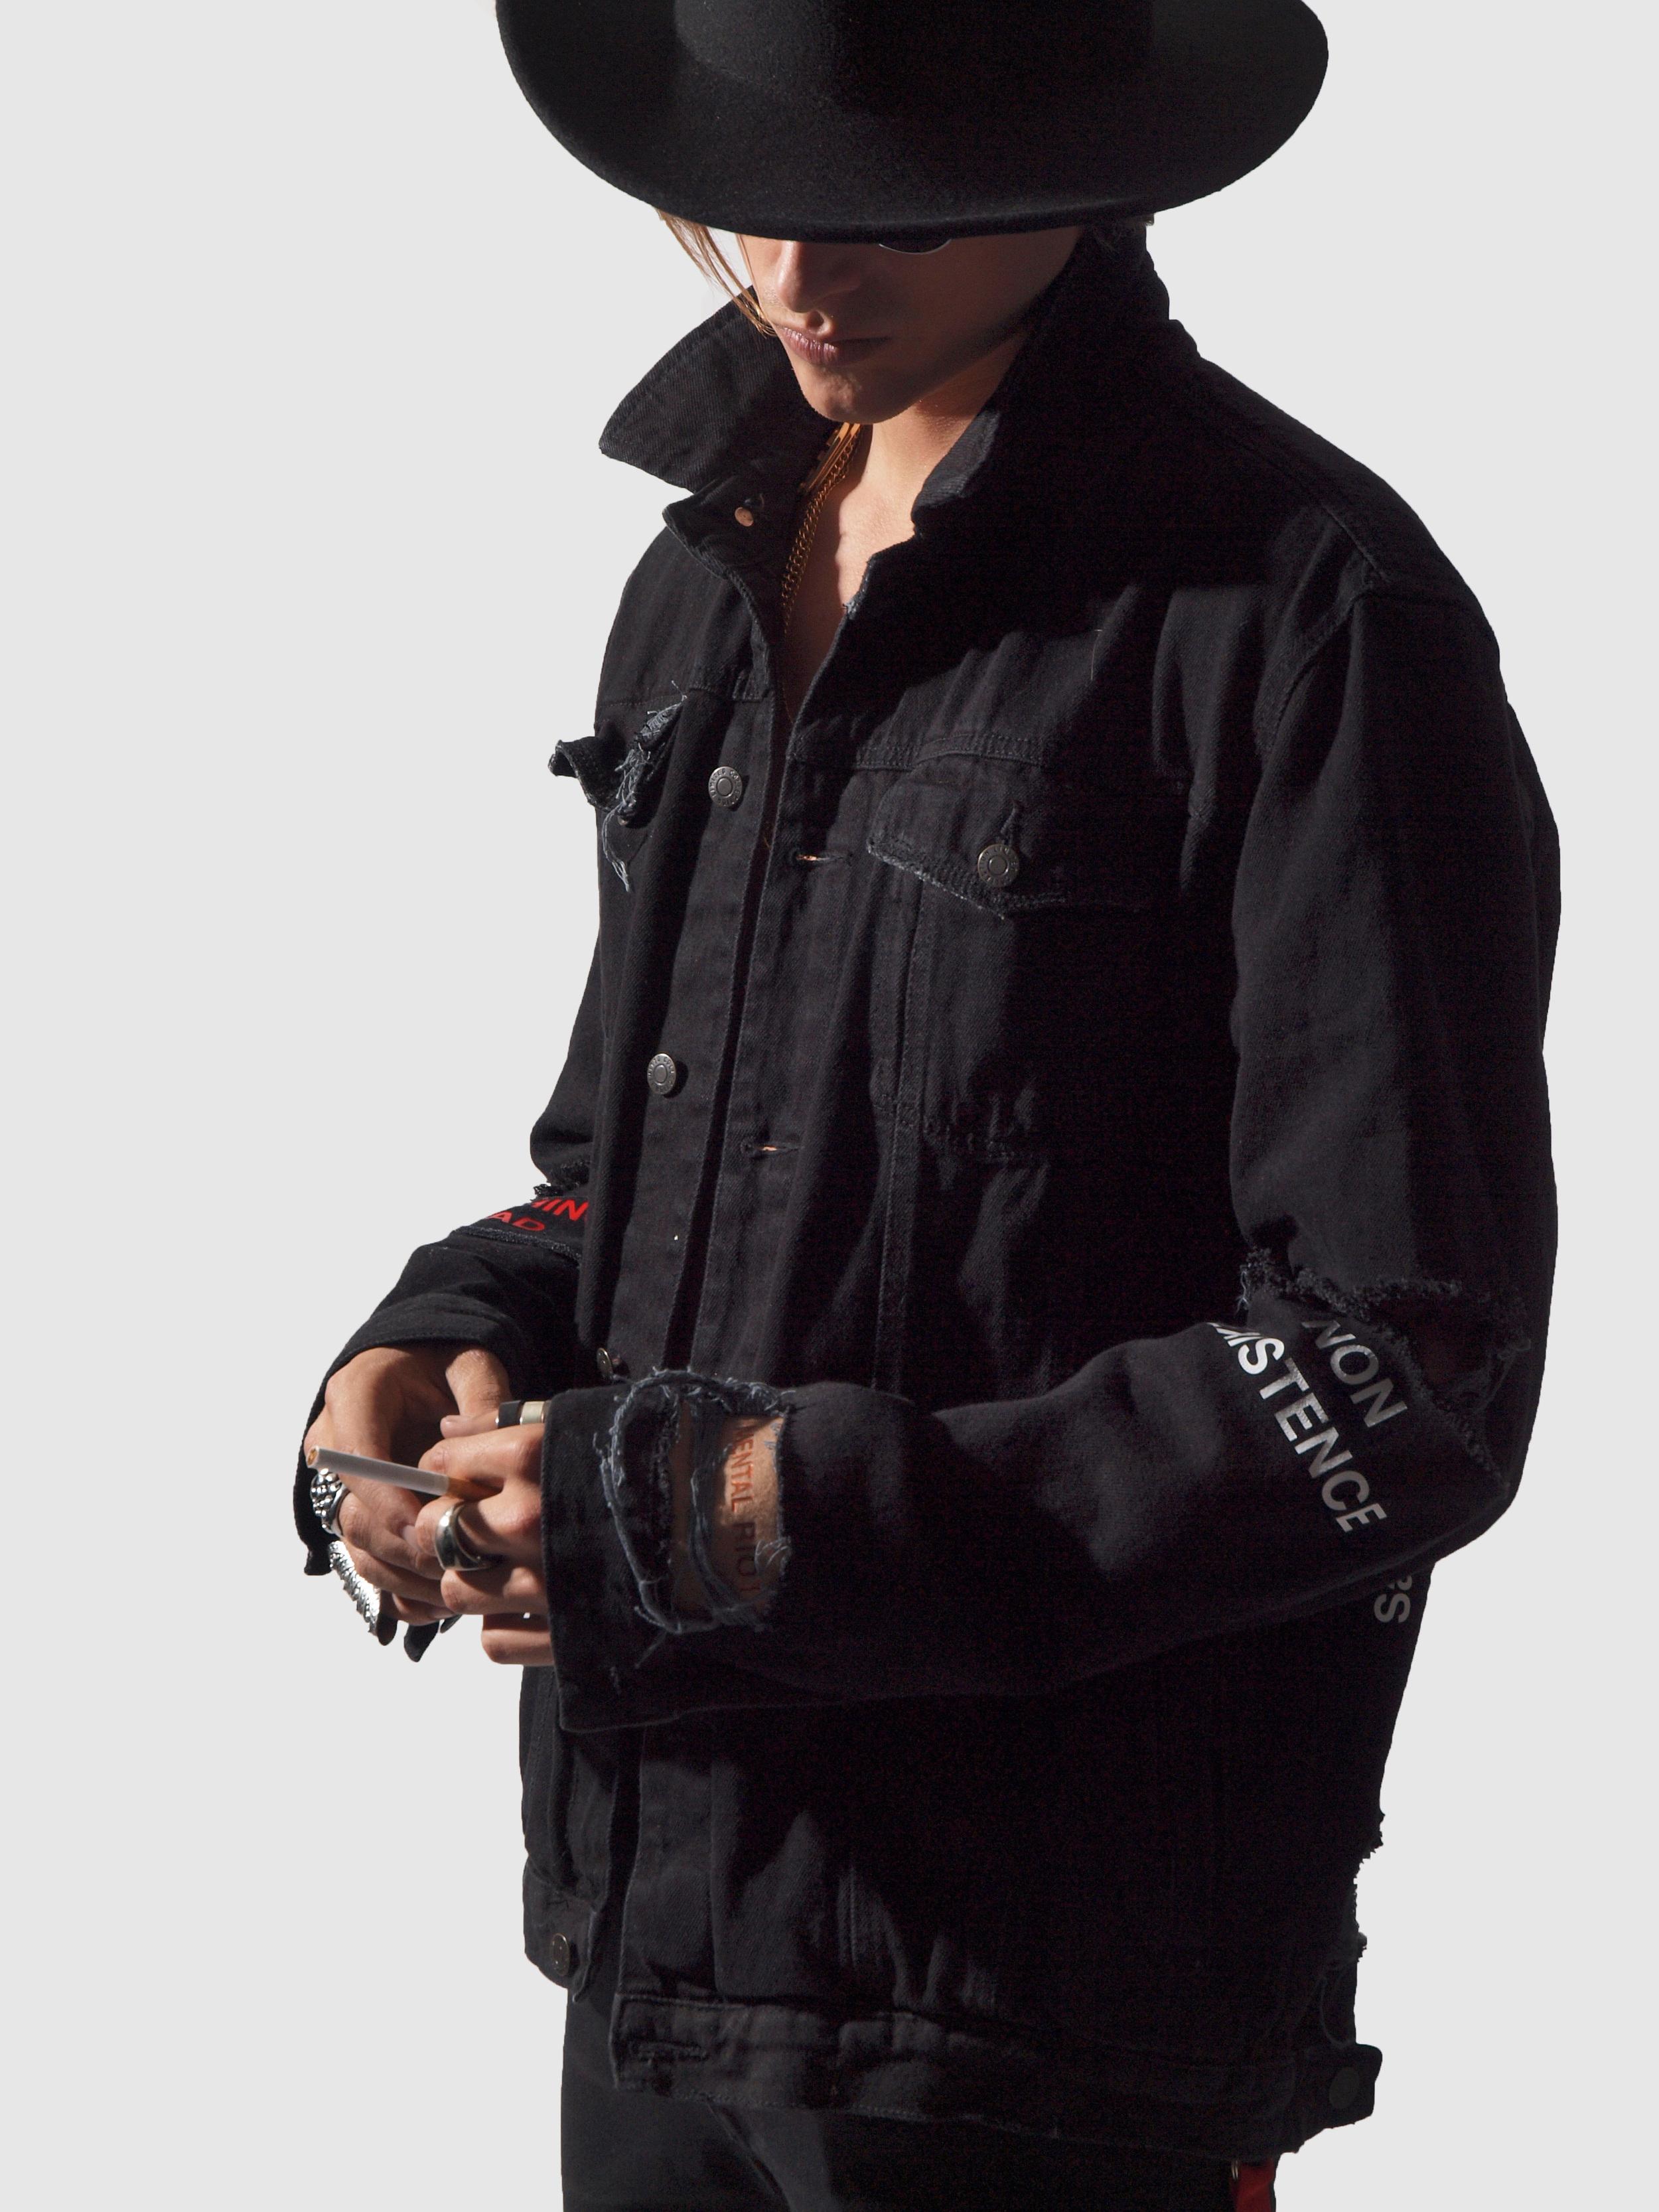 ERIS BLACK - BLACK DENIM JACKET